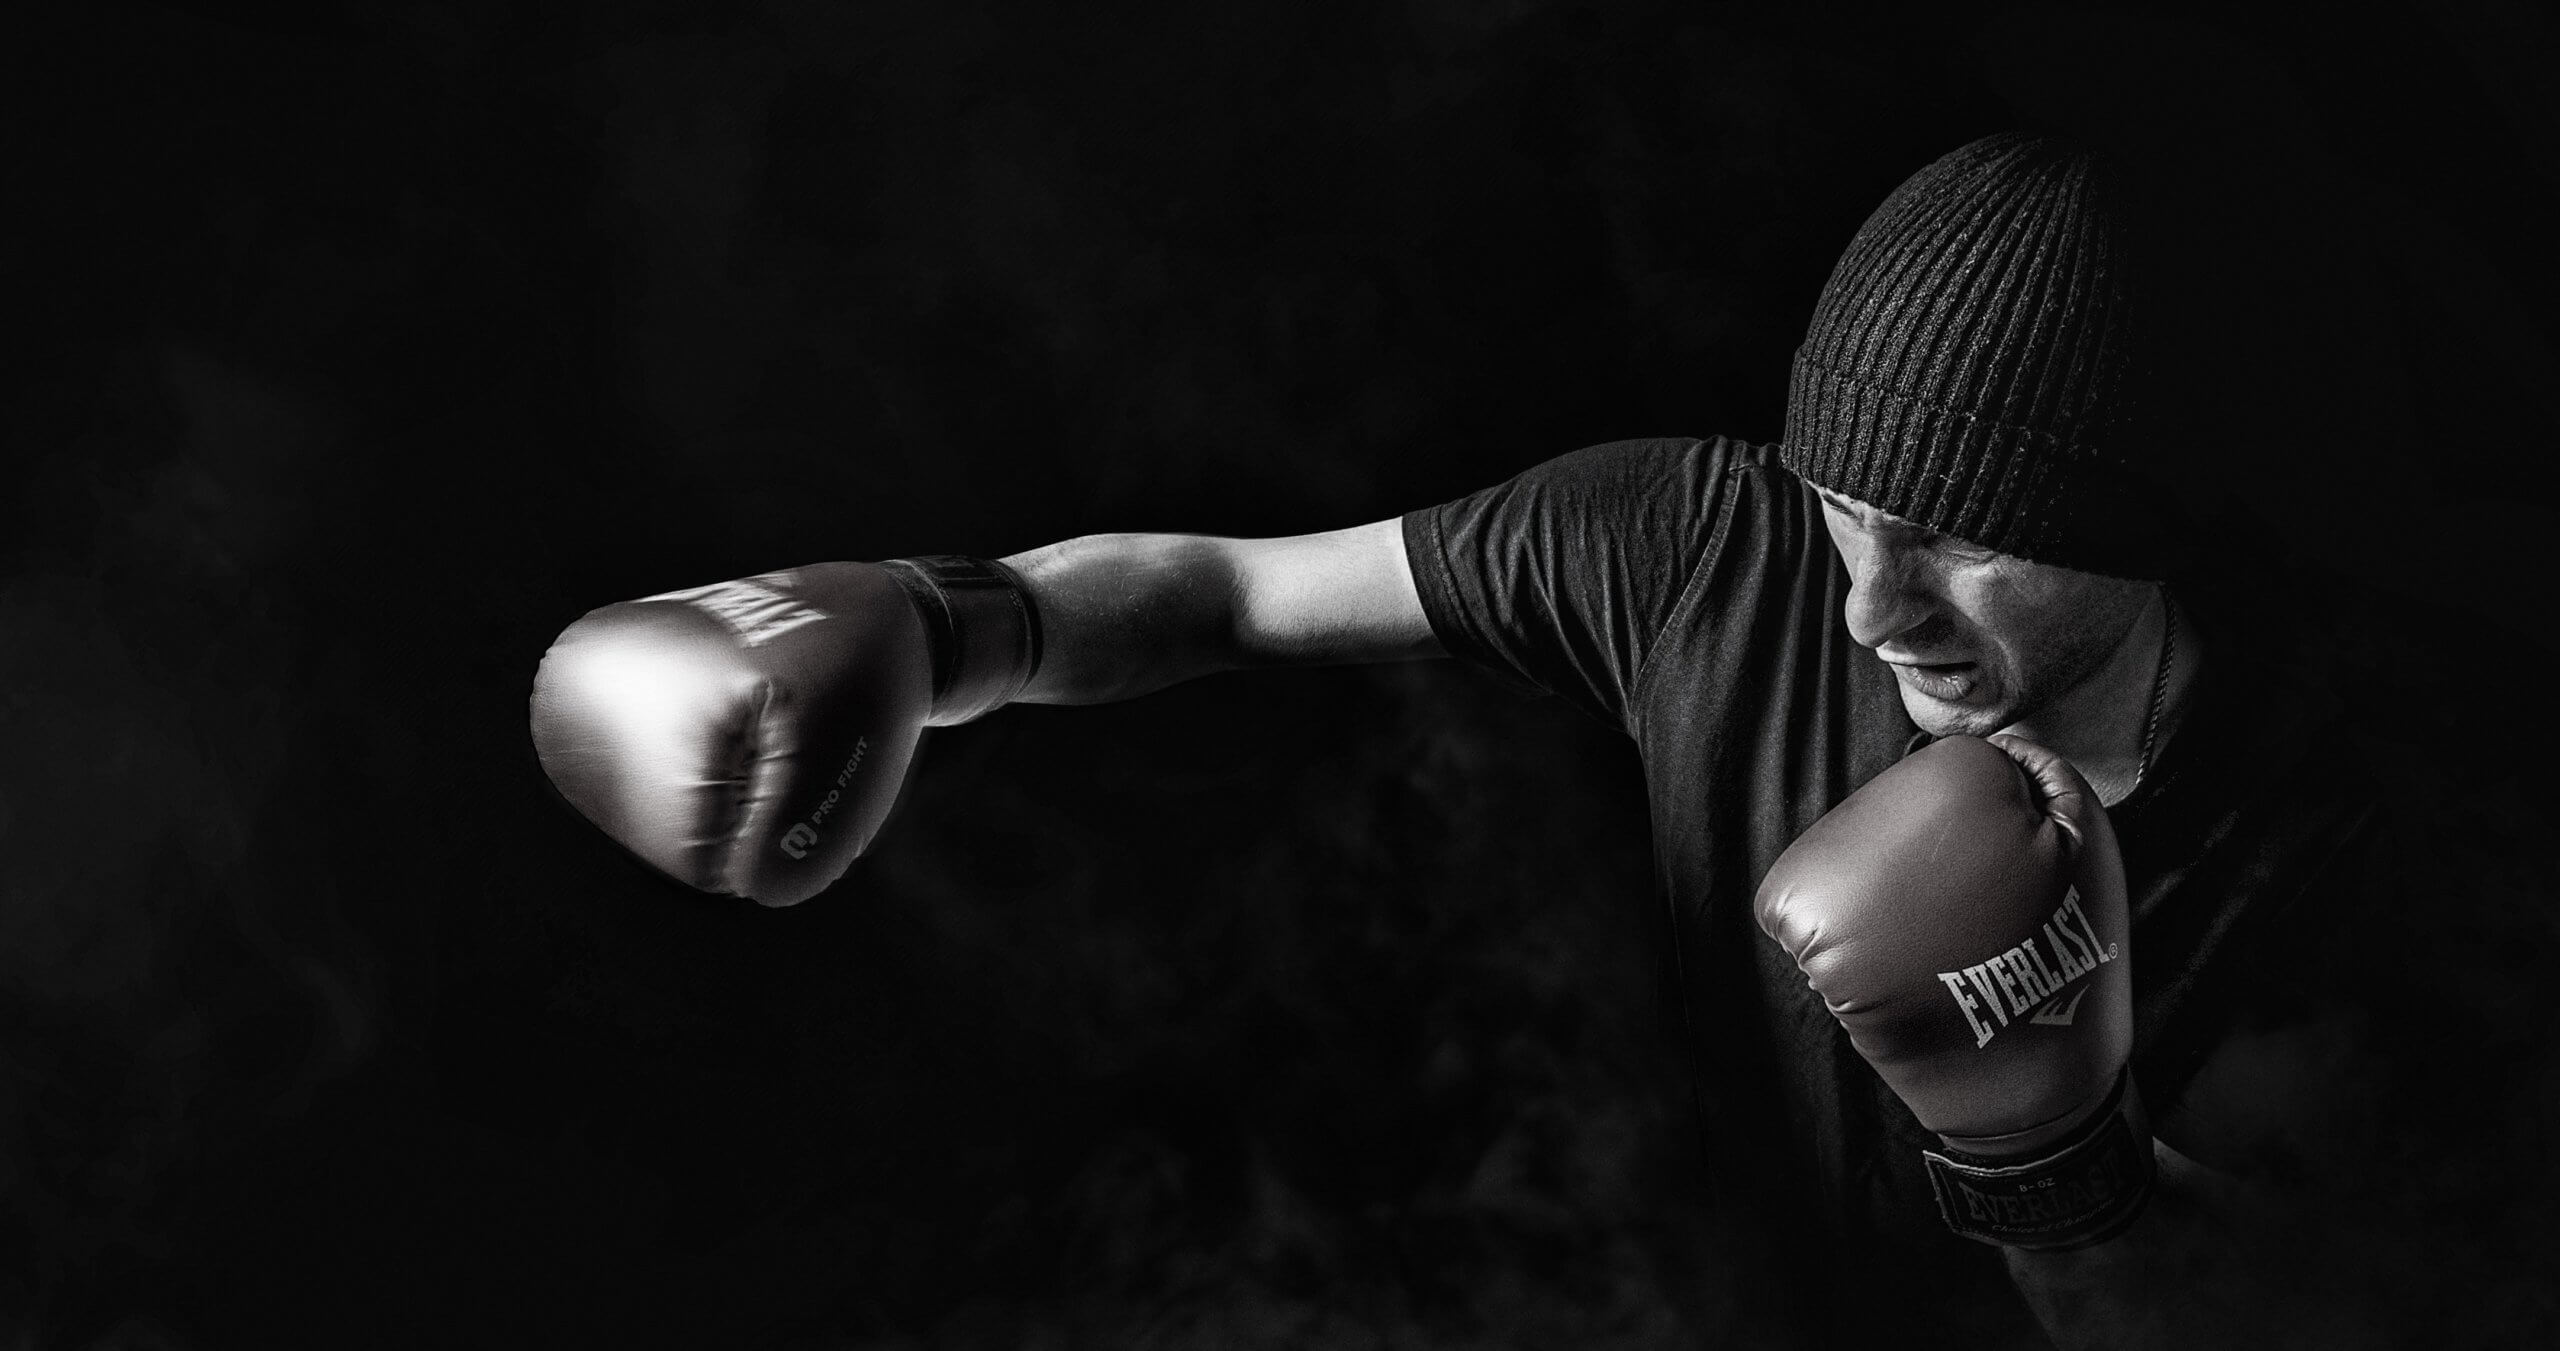 athlet ausbildung boxen boxer 163403 scaled